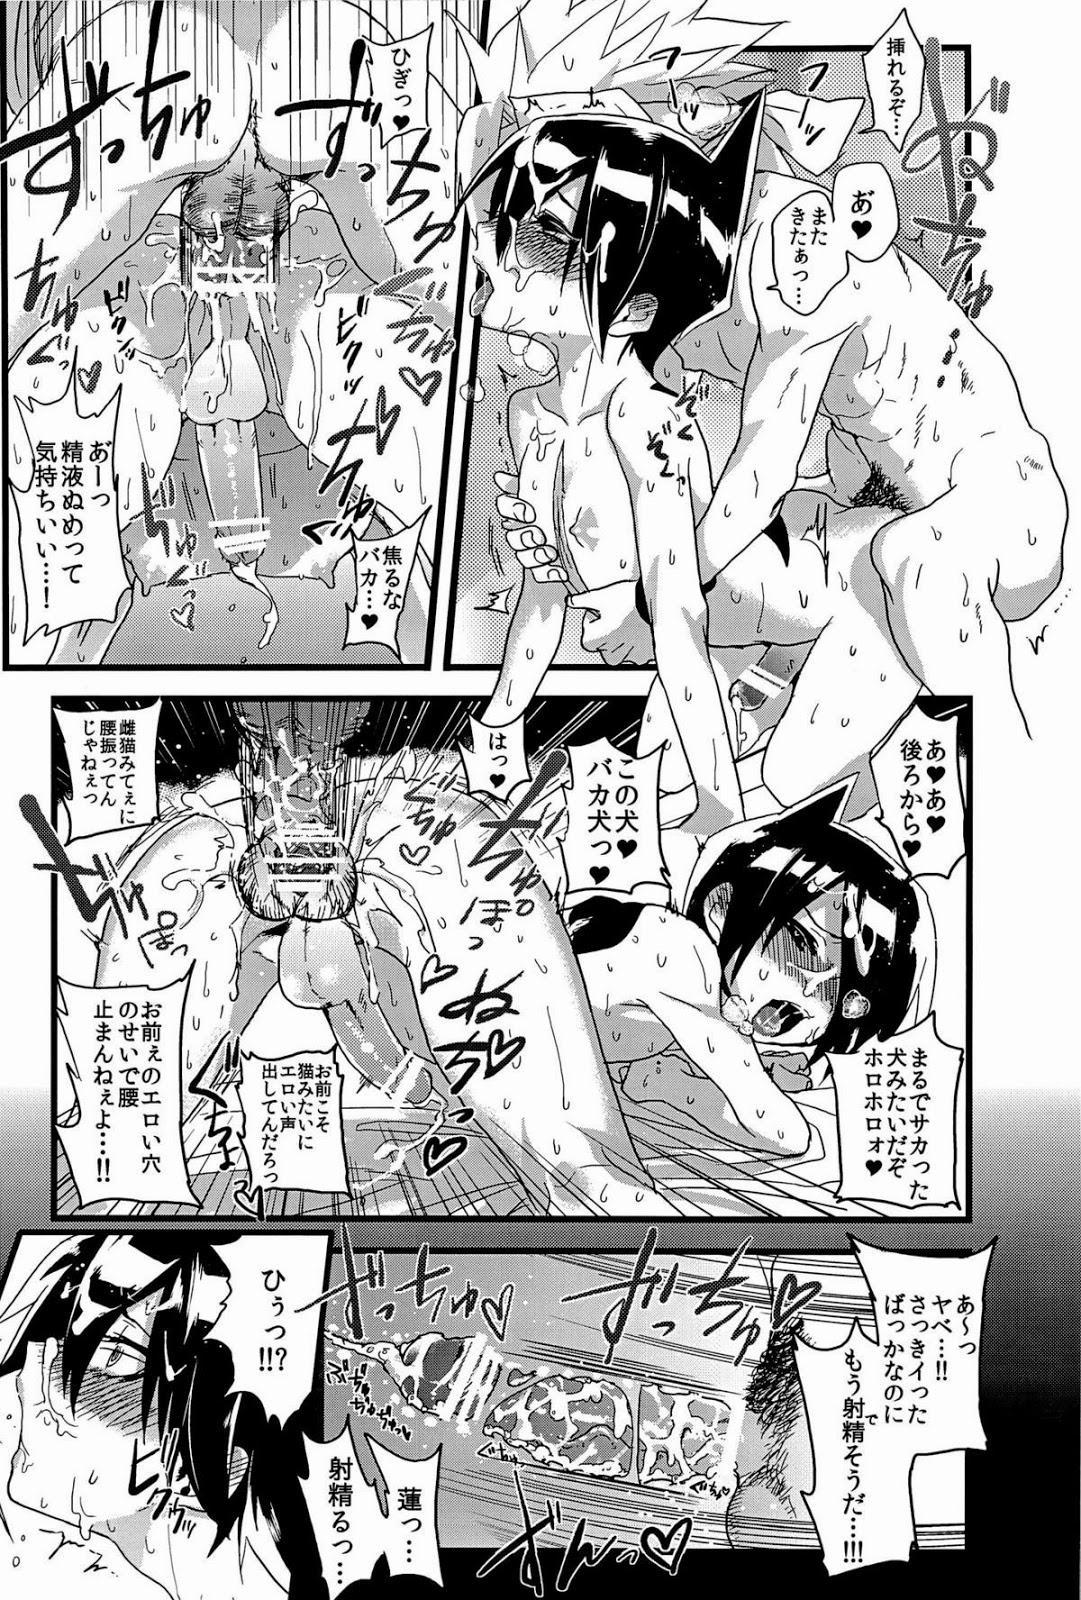 Kisama no Hajimete Ore no Mono! 15